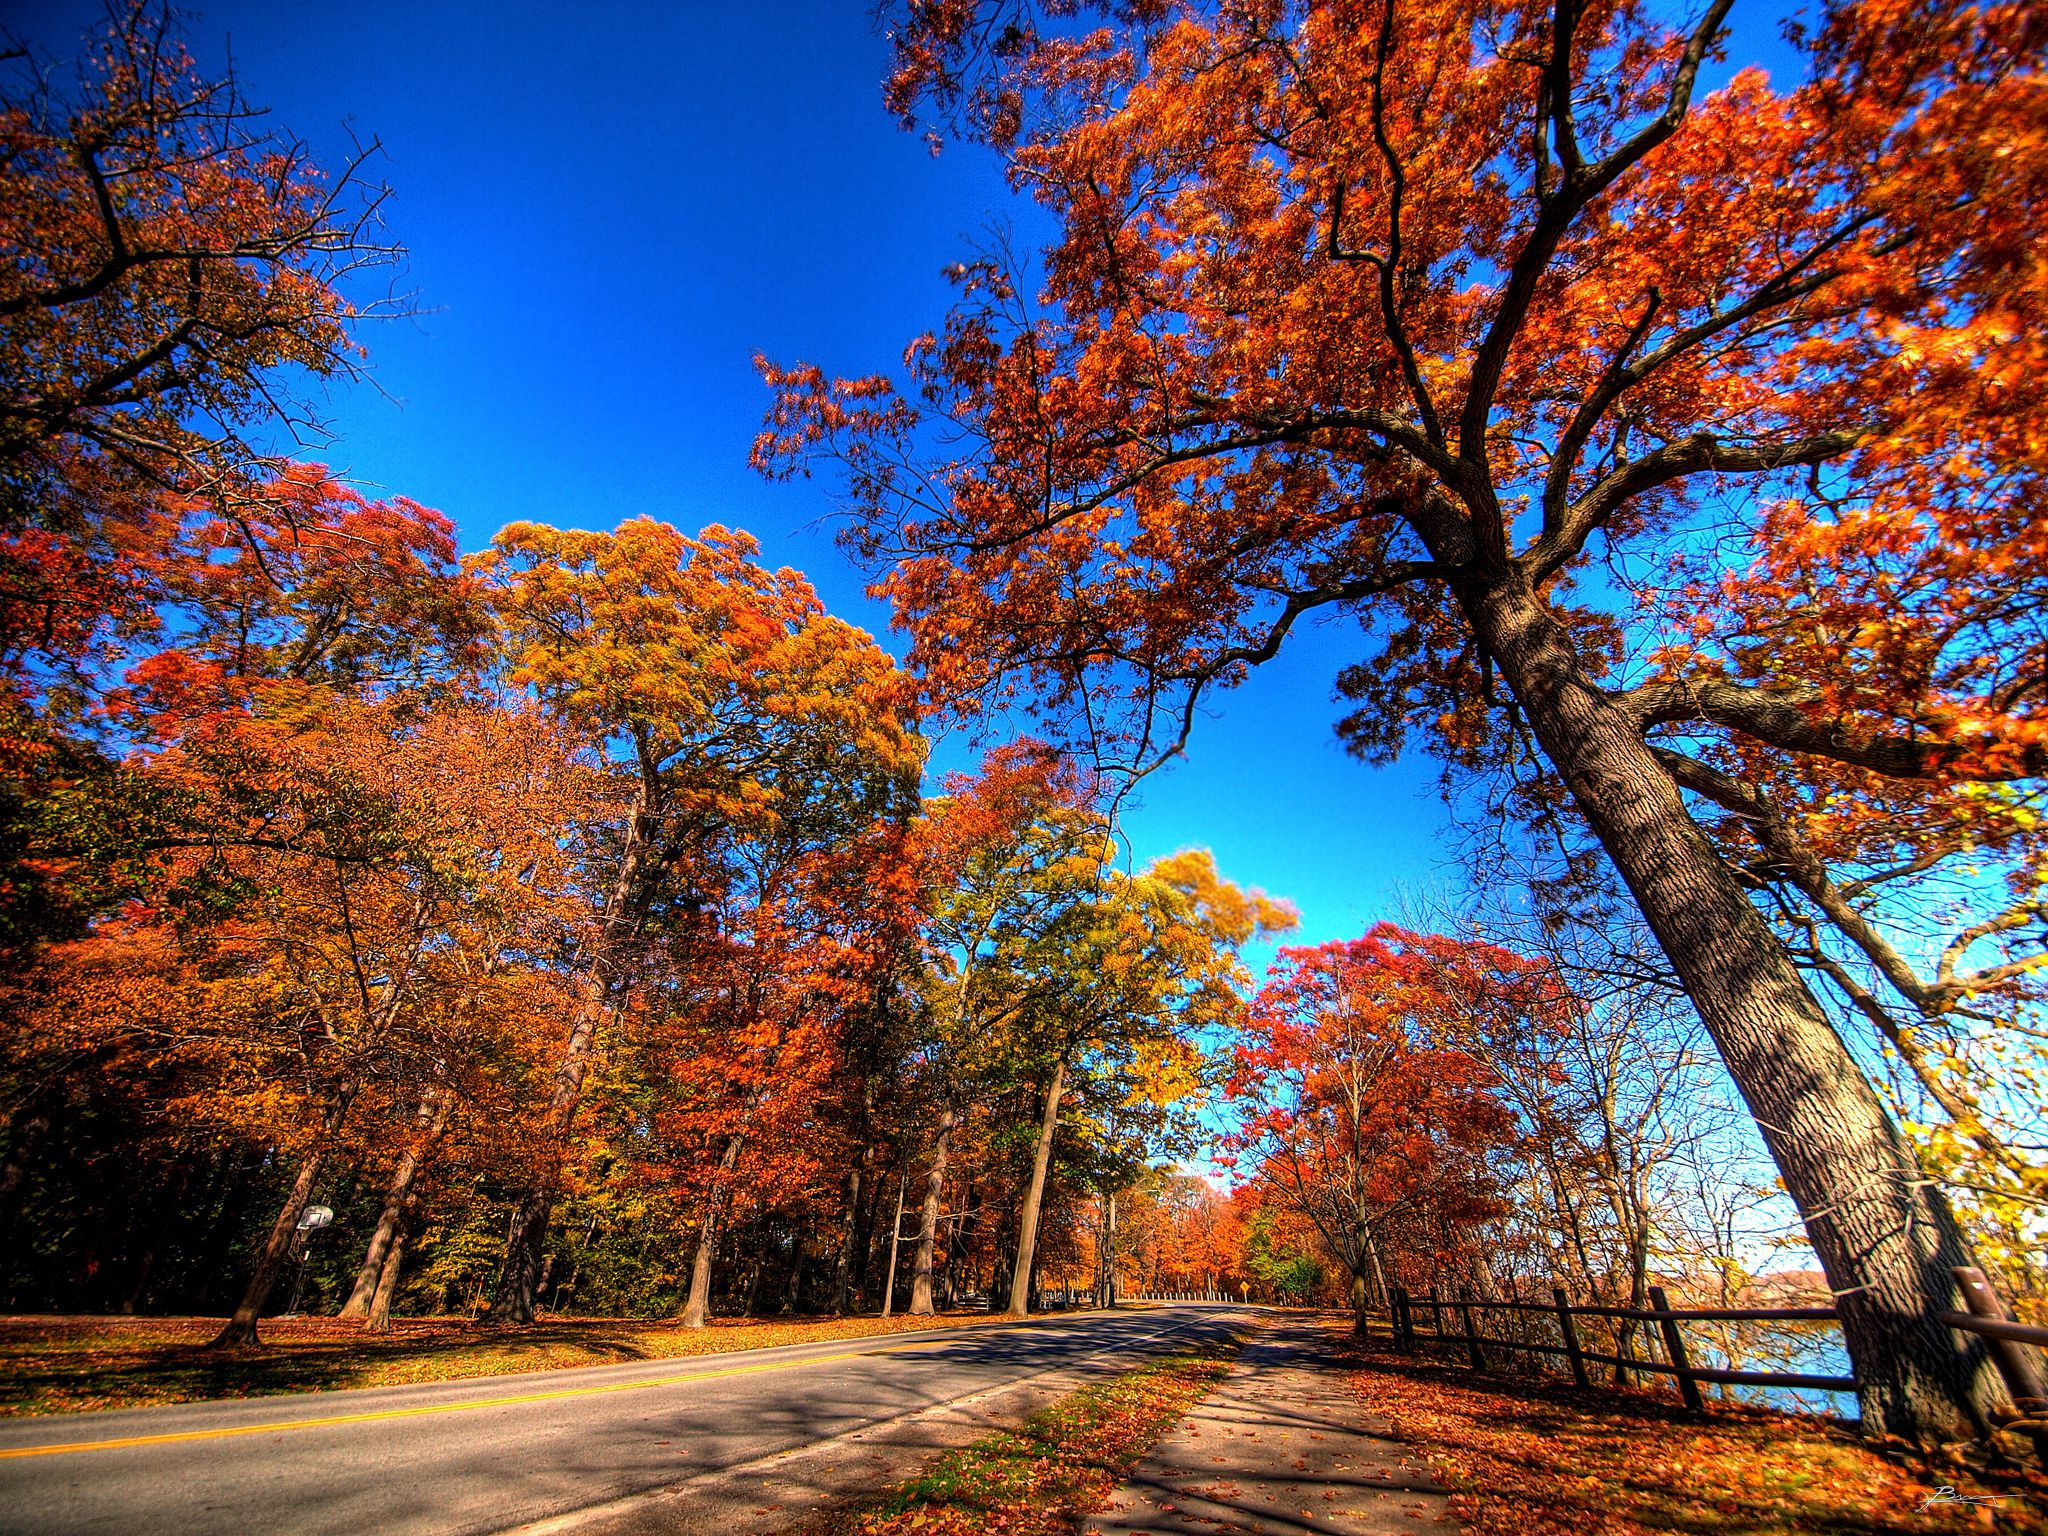 Roadway at Niagara-on-the-Lake in Ontario.